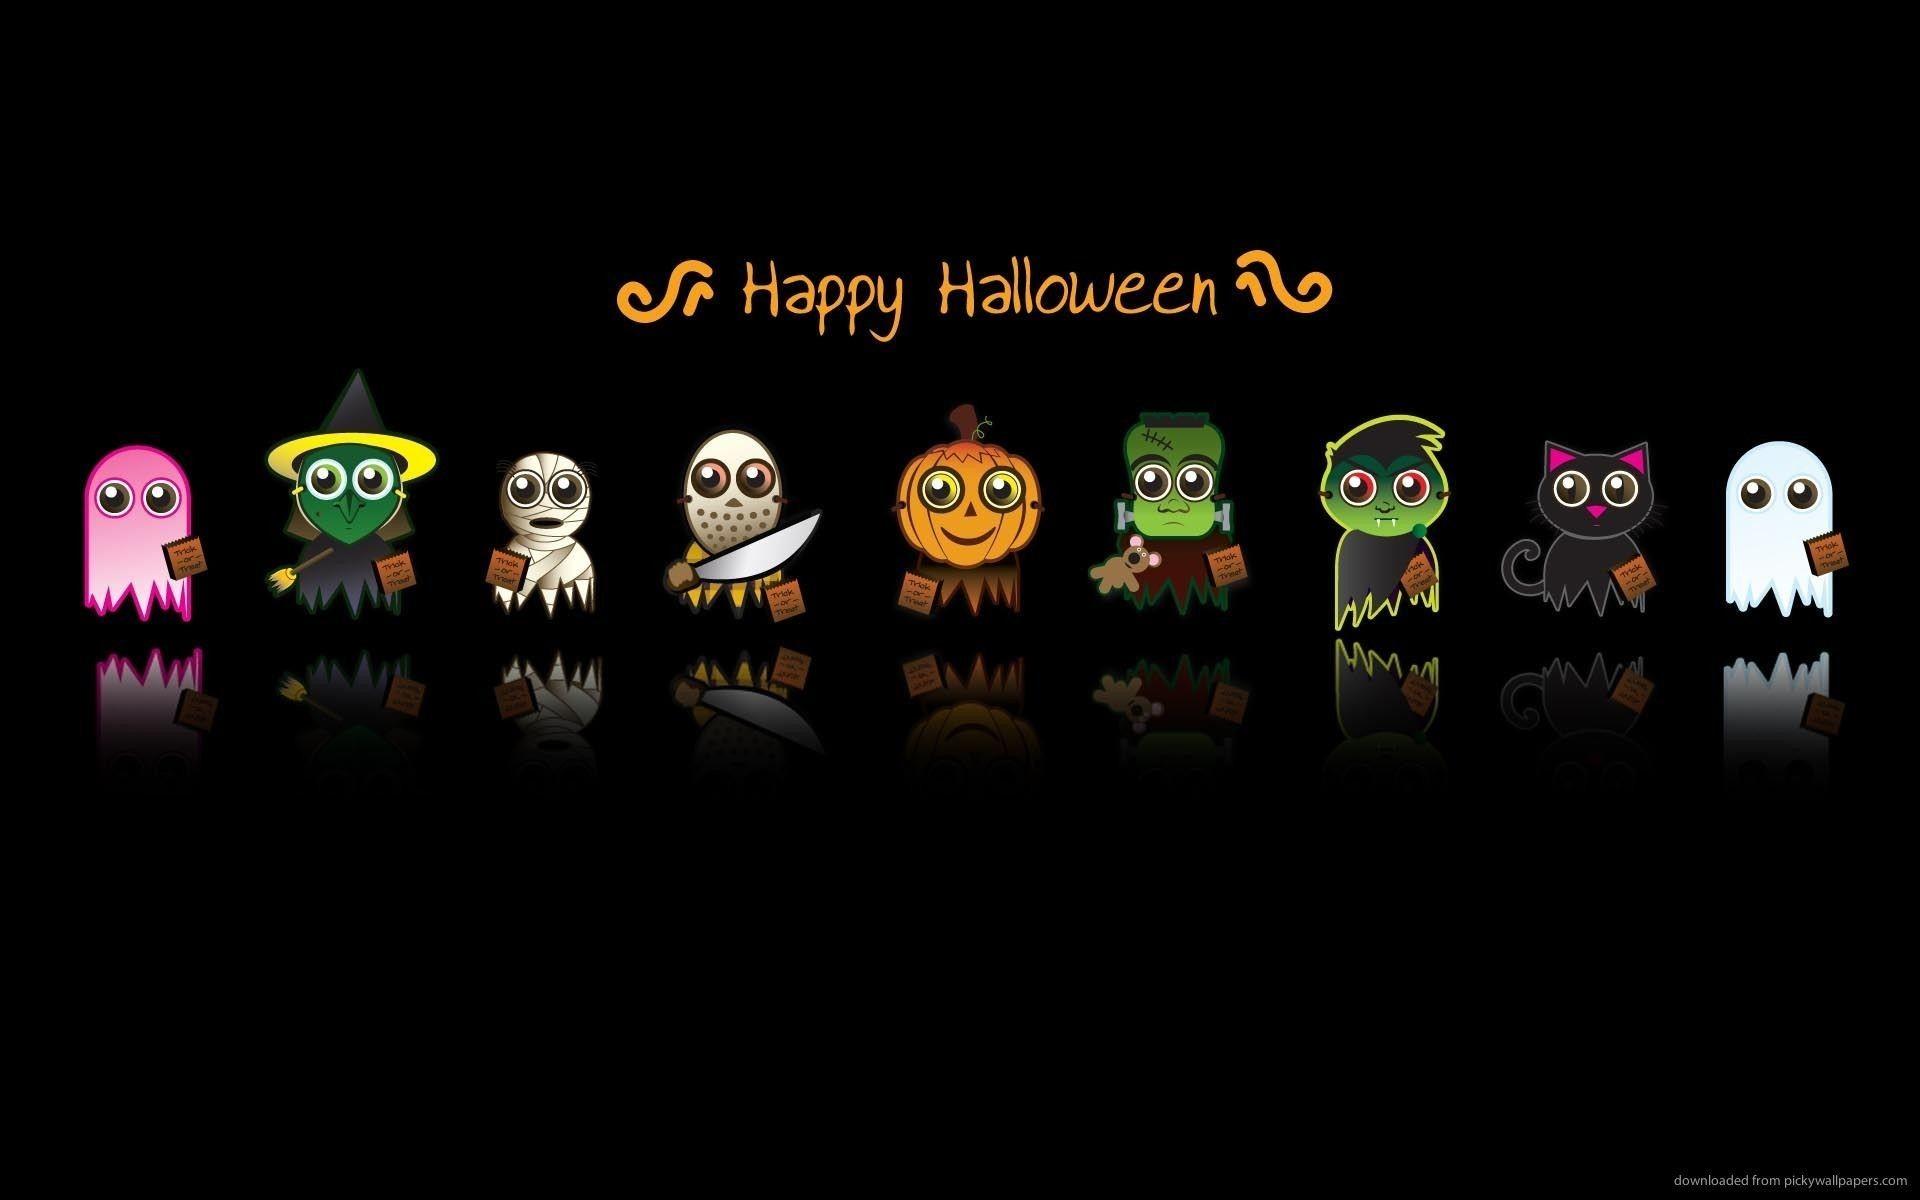 Cute Halloween wallpaper high quality